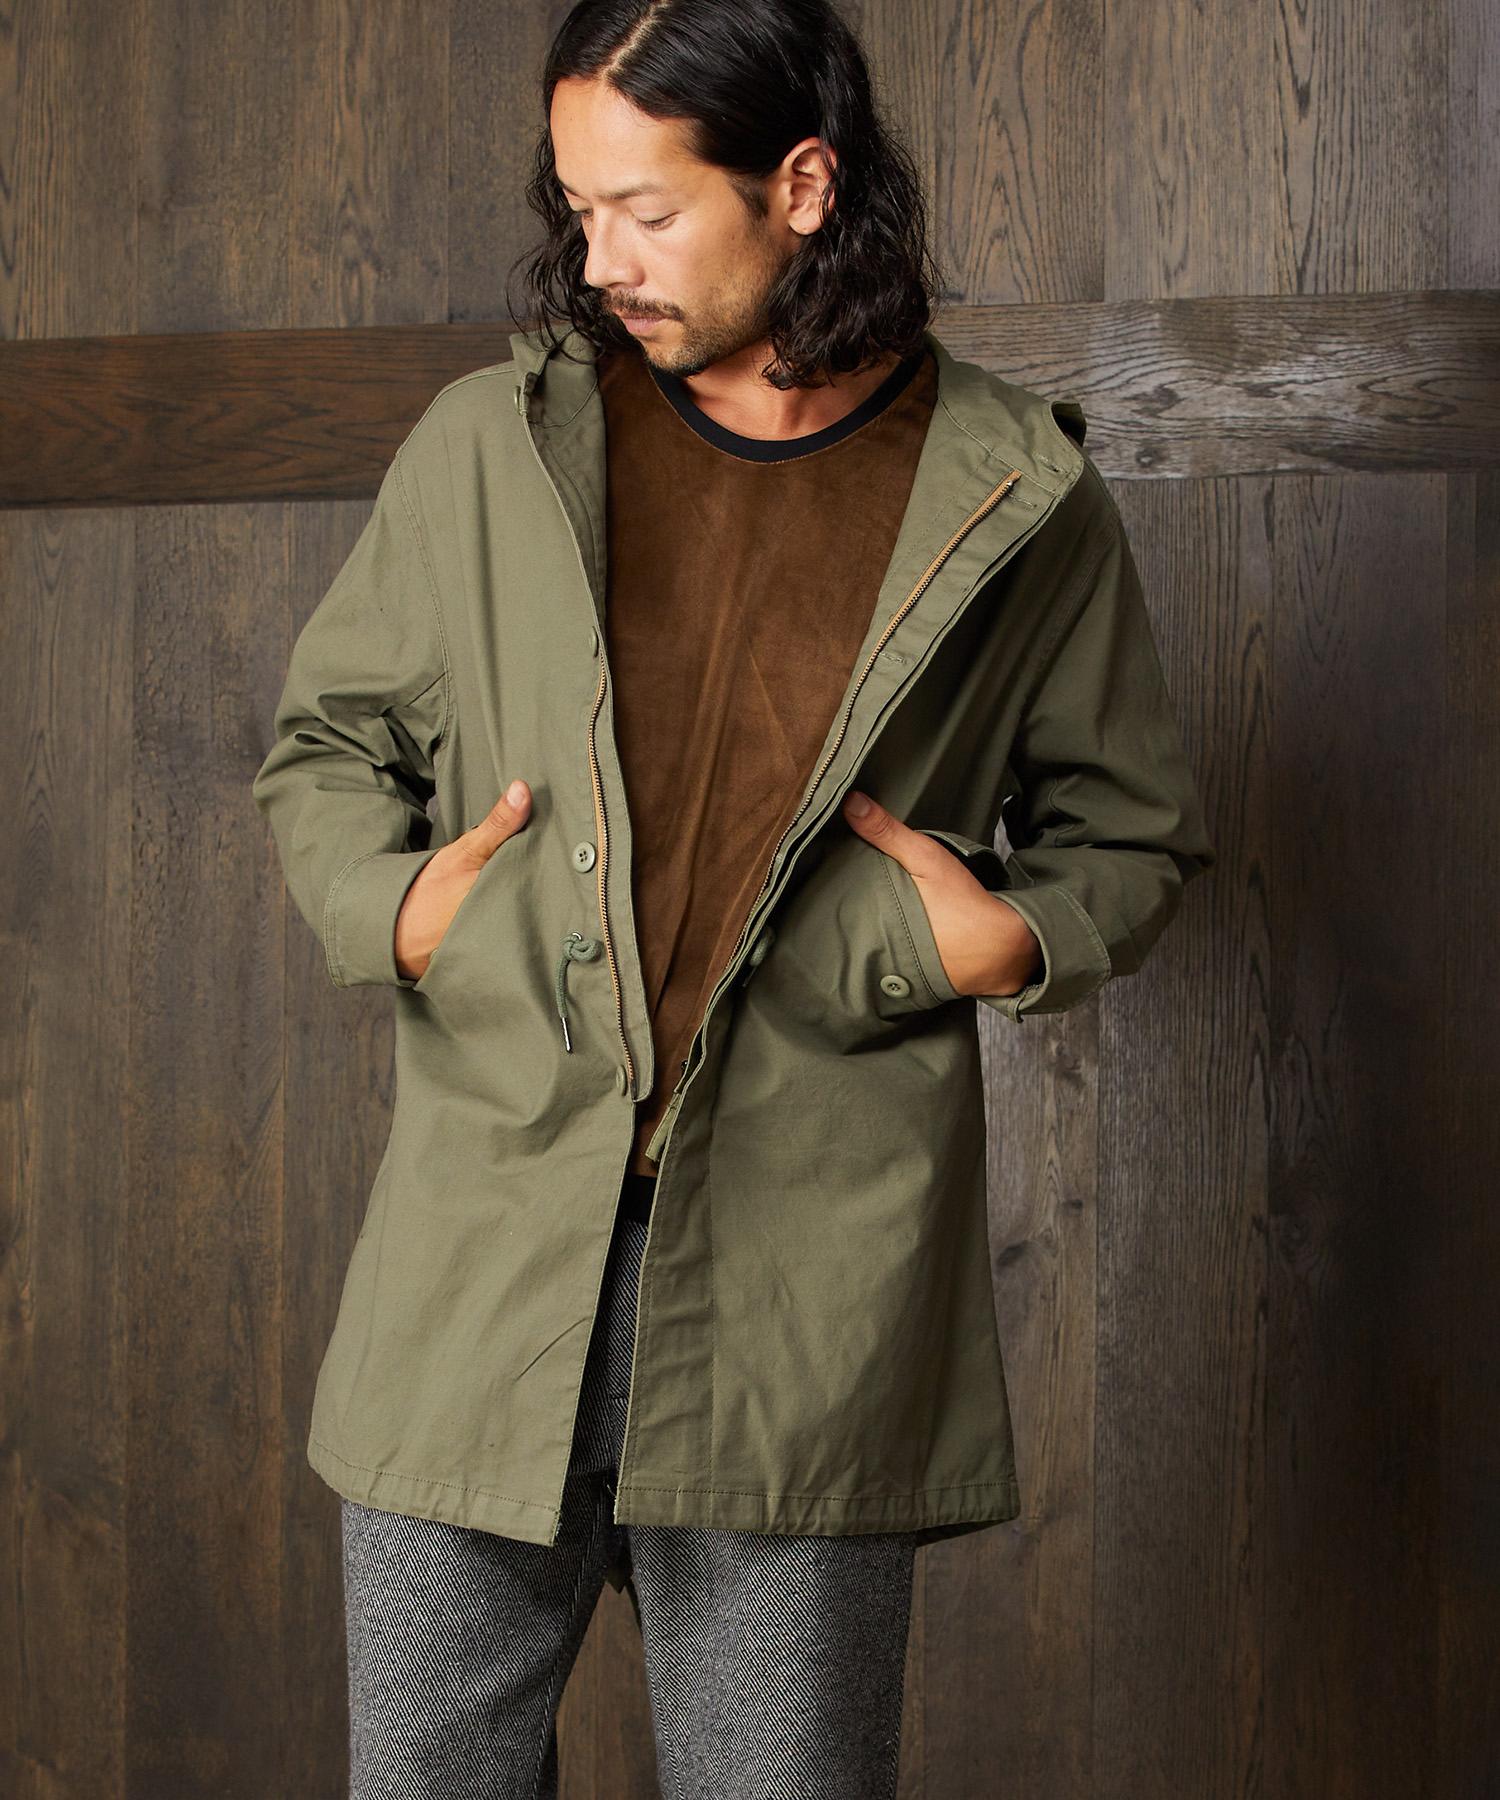 【CAMBIO(カンビオ)】【予約販売10月上旬~中旬入荷】Stretch Twill Loose Fit M-51 Field Coat フィールドコート